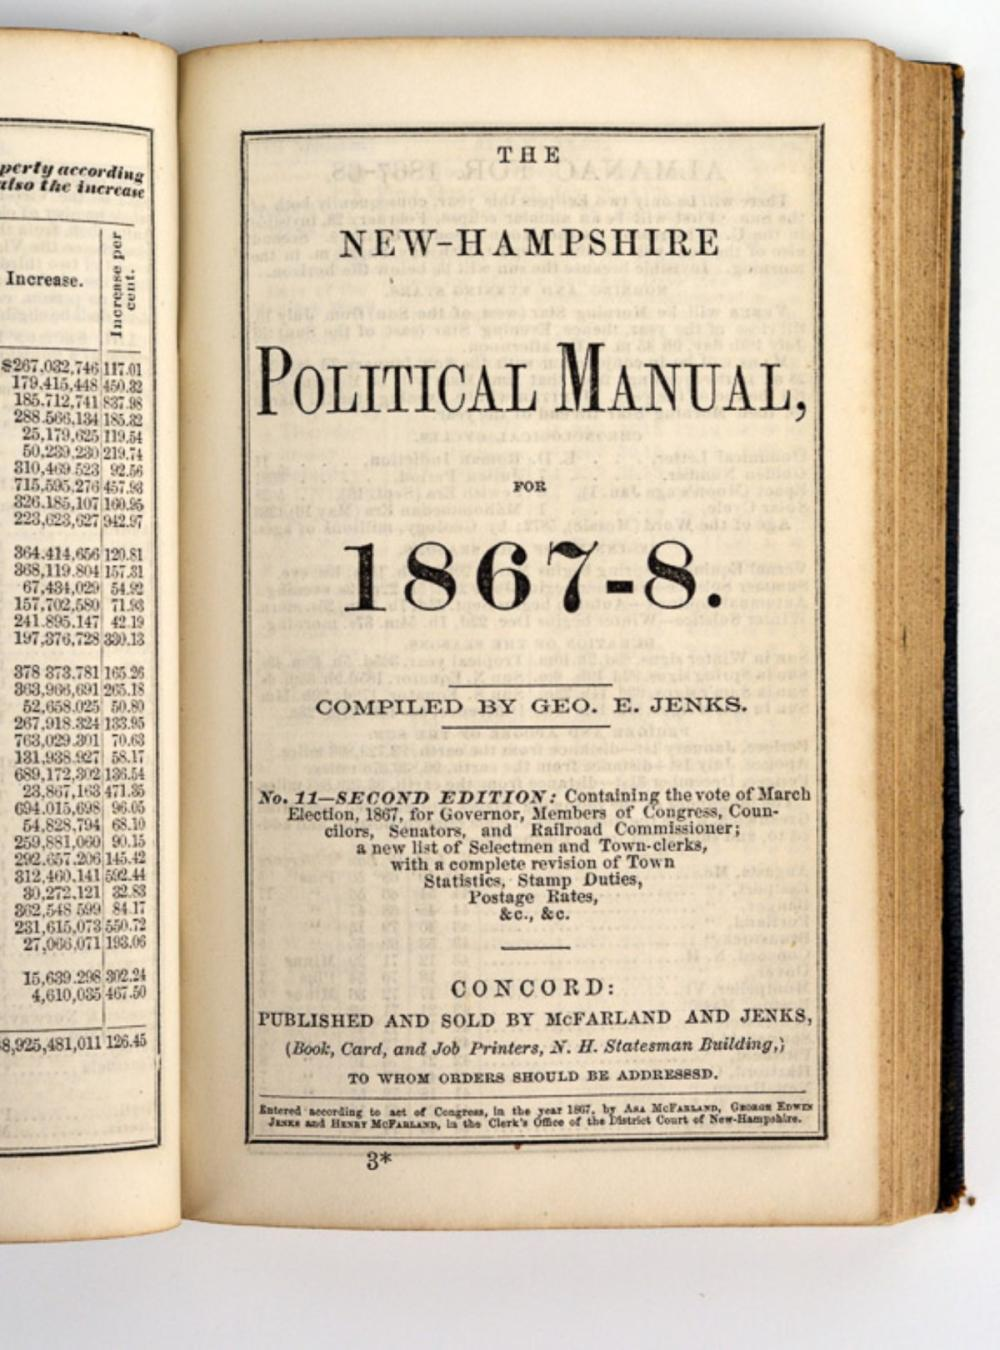 New Hampshire rulebook belonging to Civil War General Stevens